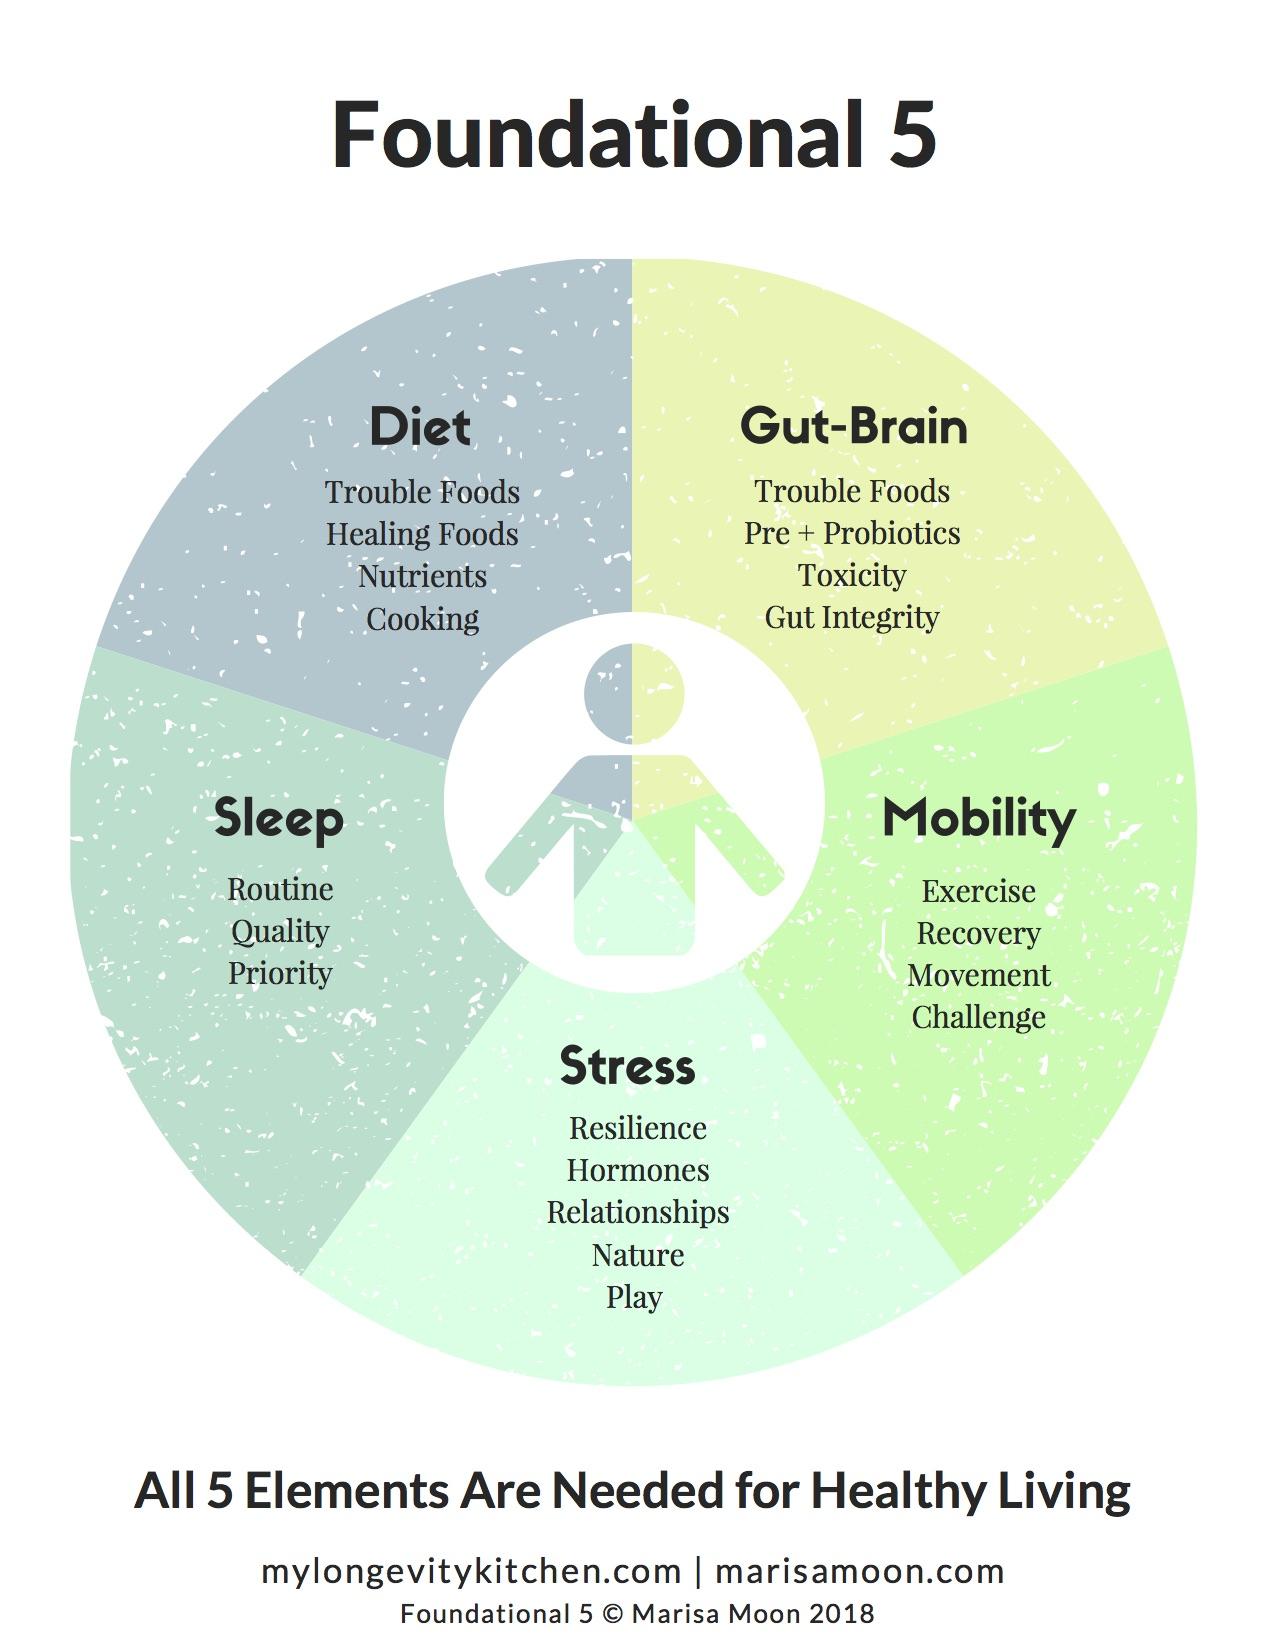 Foundational 5 Elements of Good Health Marisa Moon (3).jpg